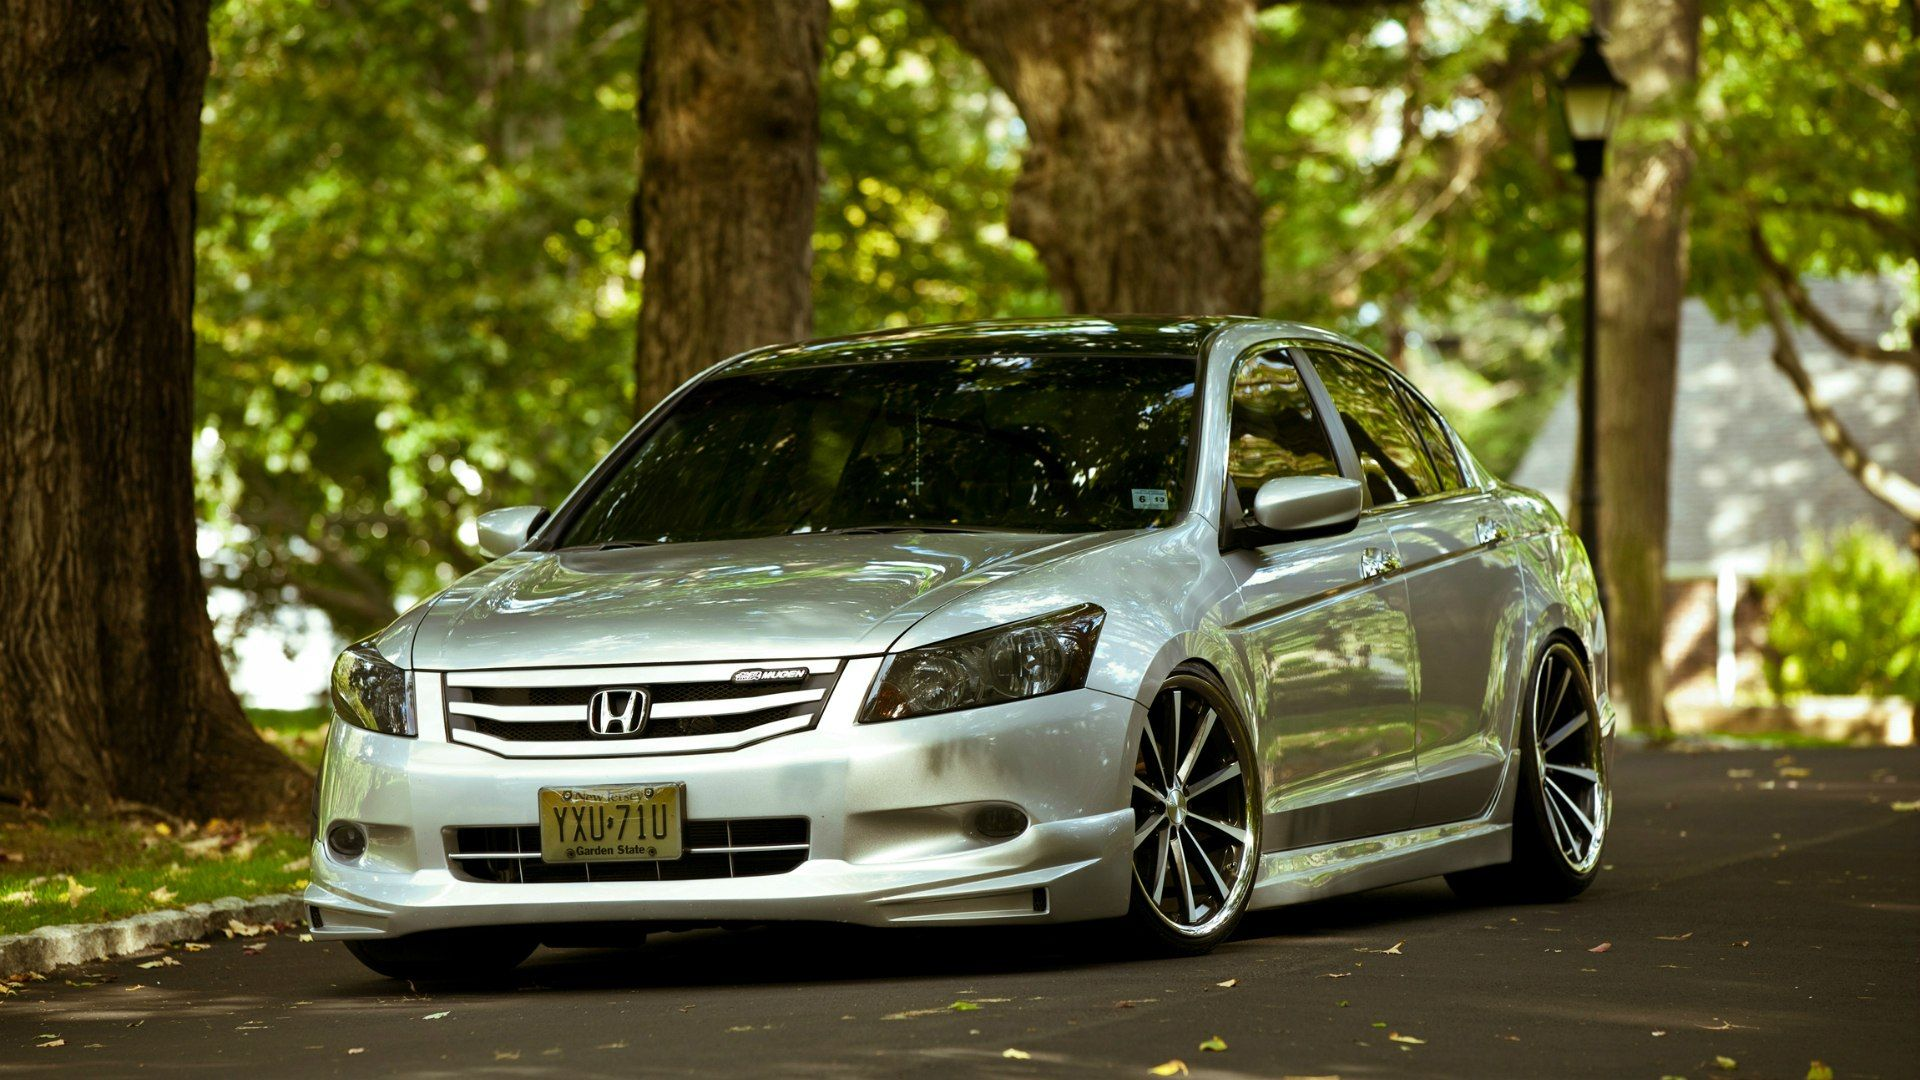 Honda Accord nice wallpaper